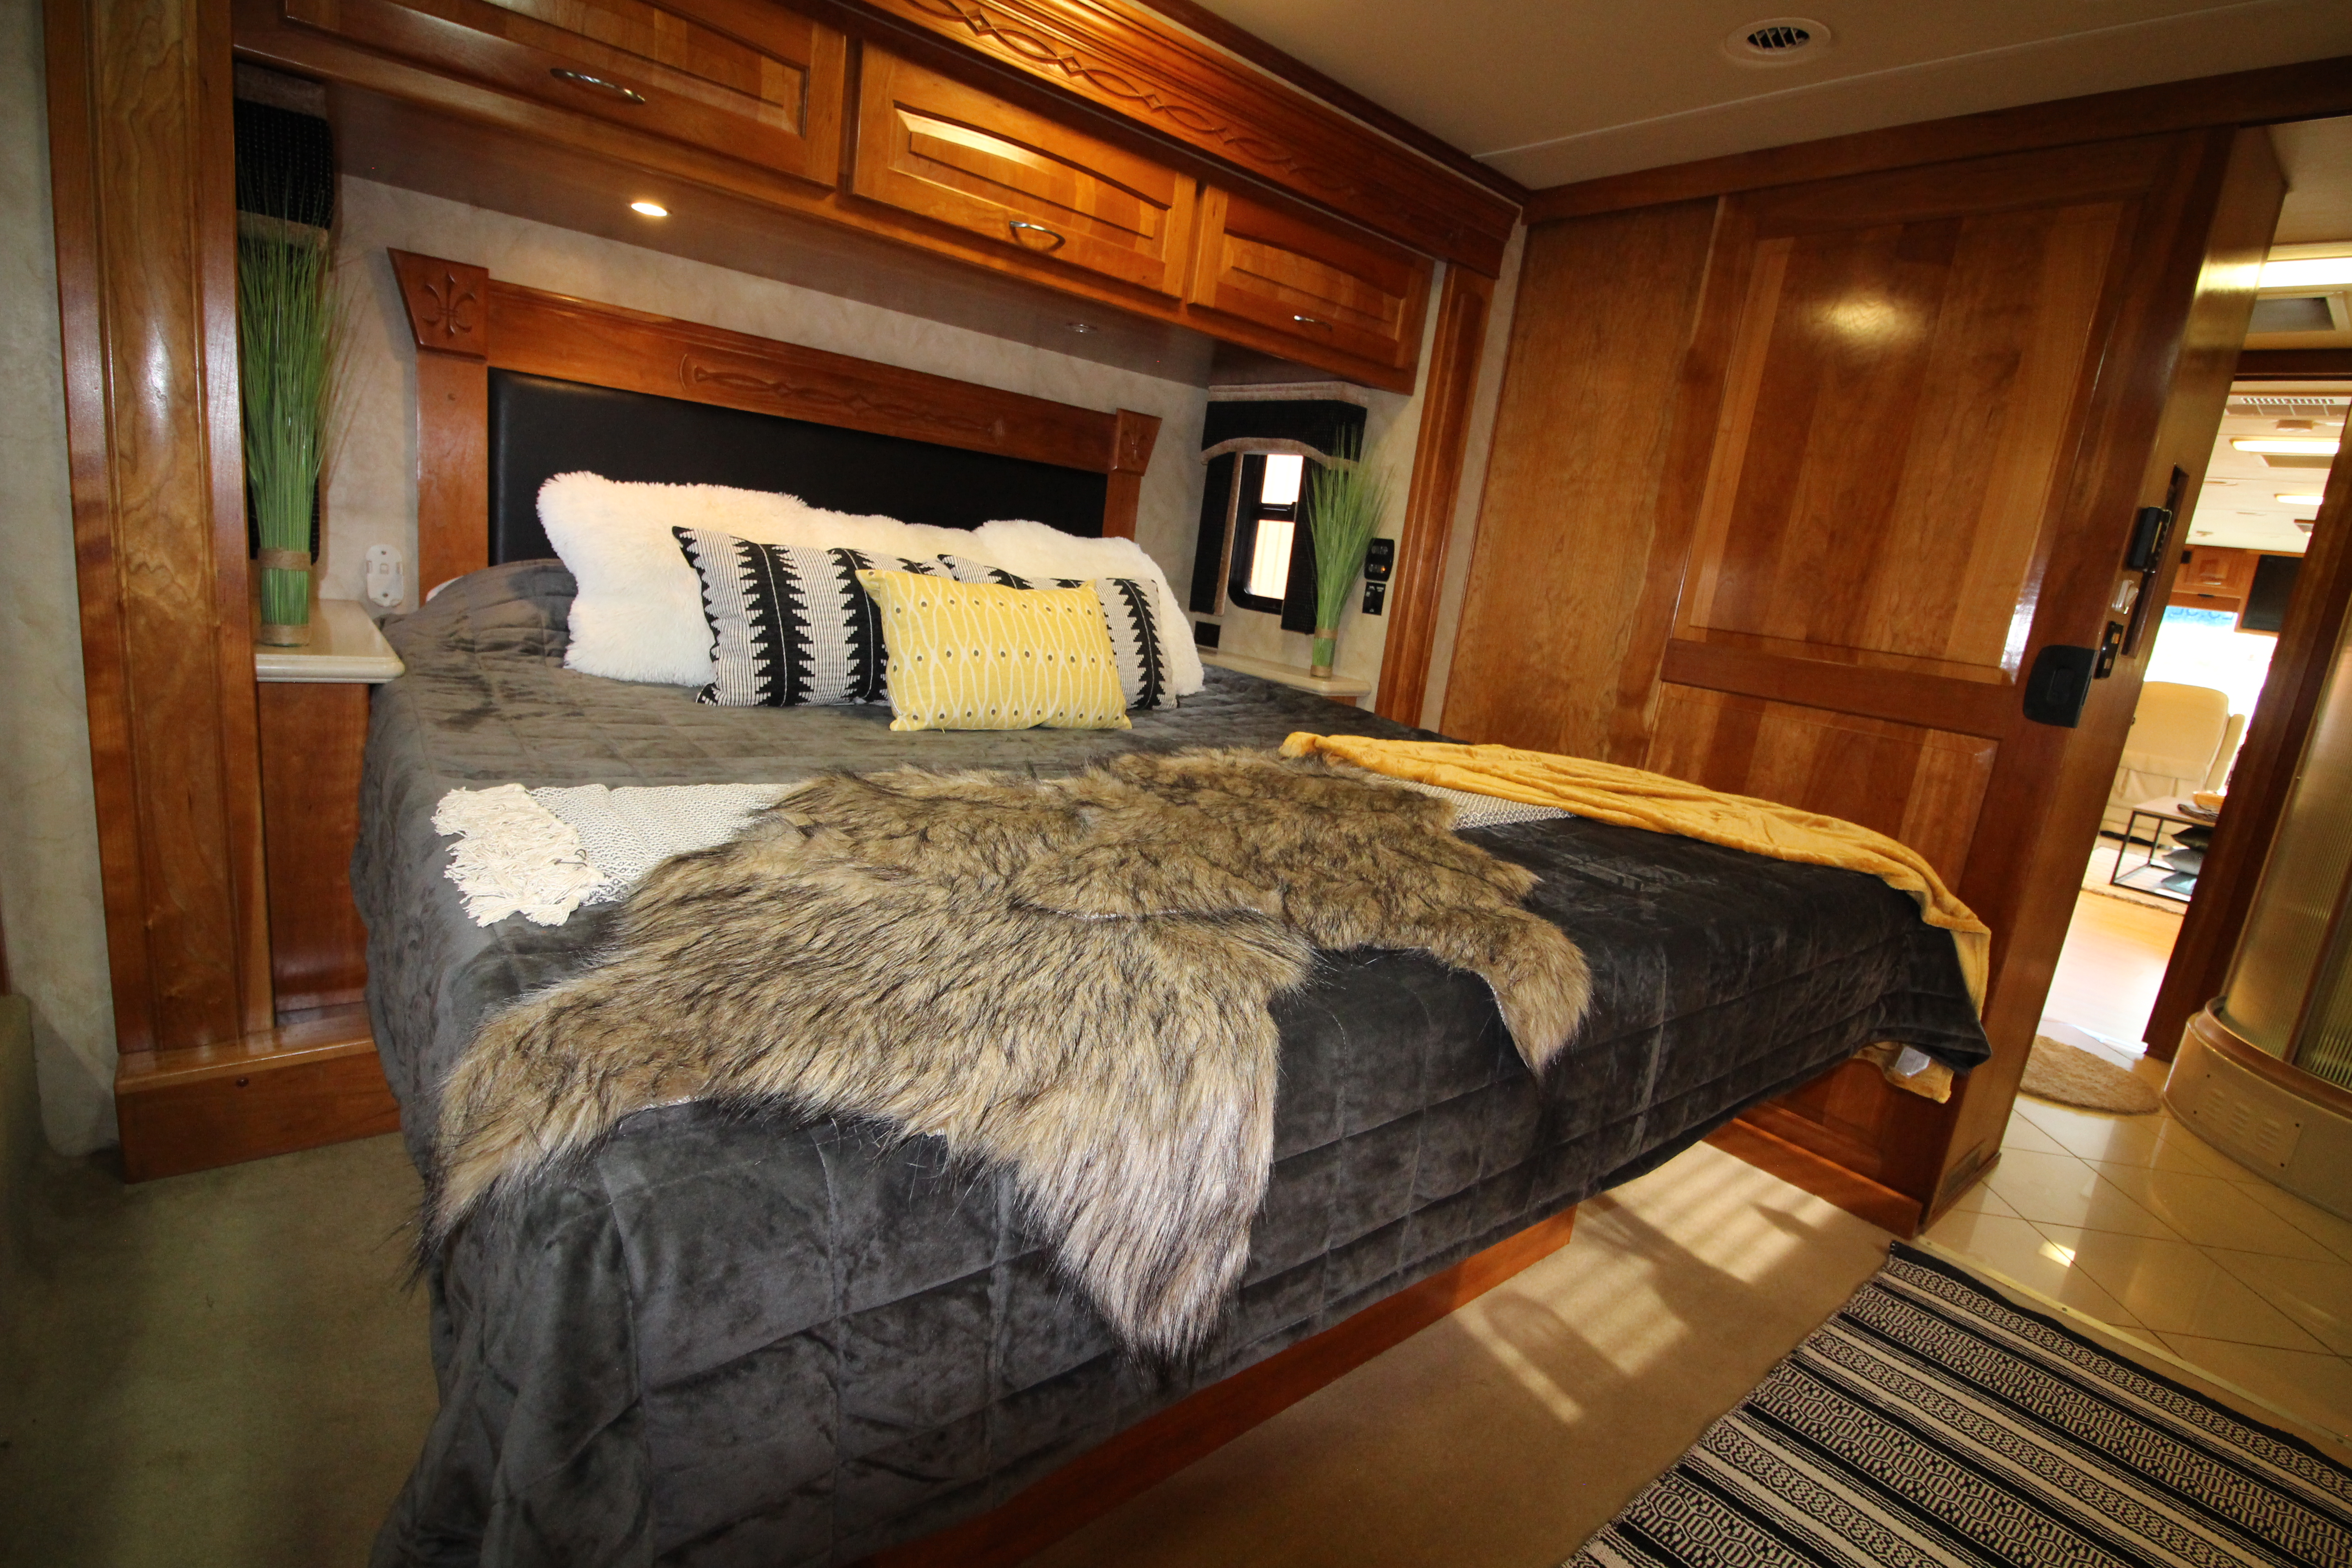 King Size Super + Bed